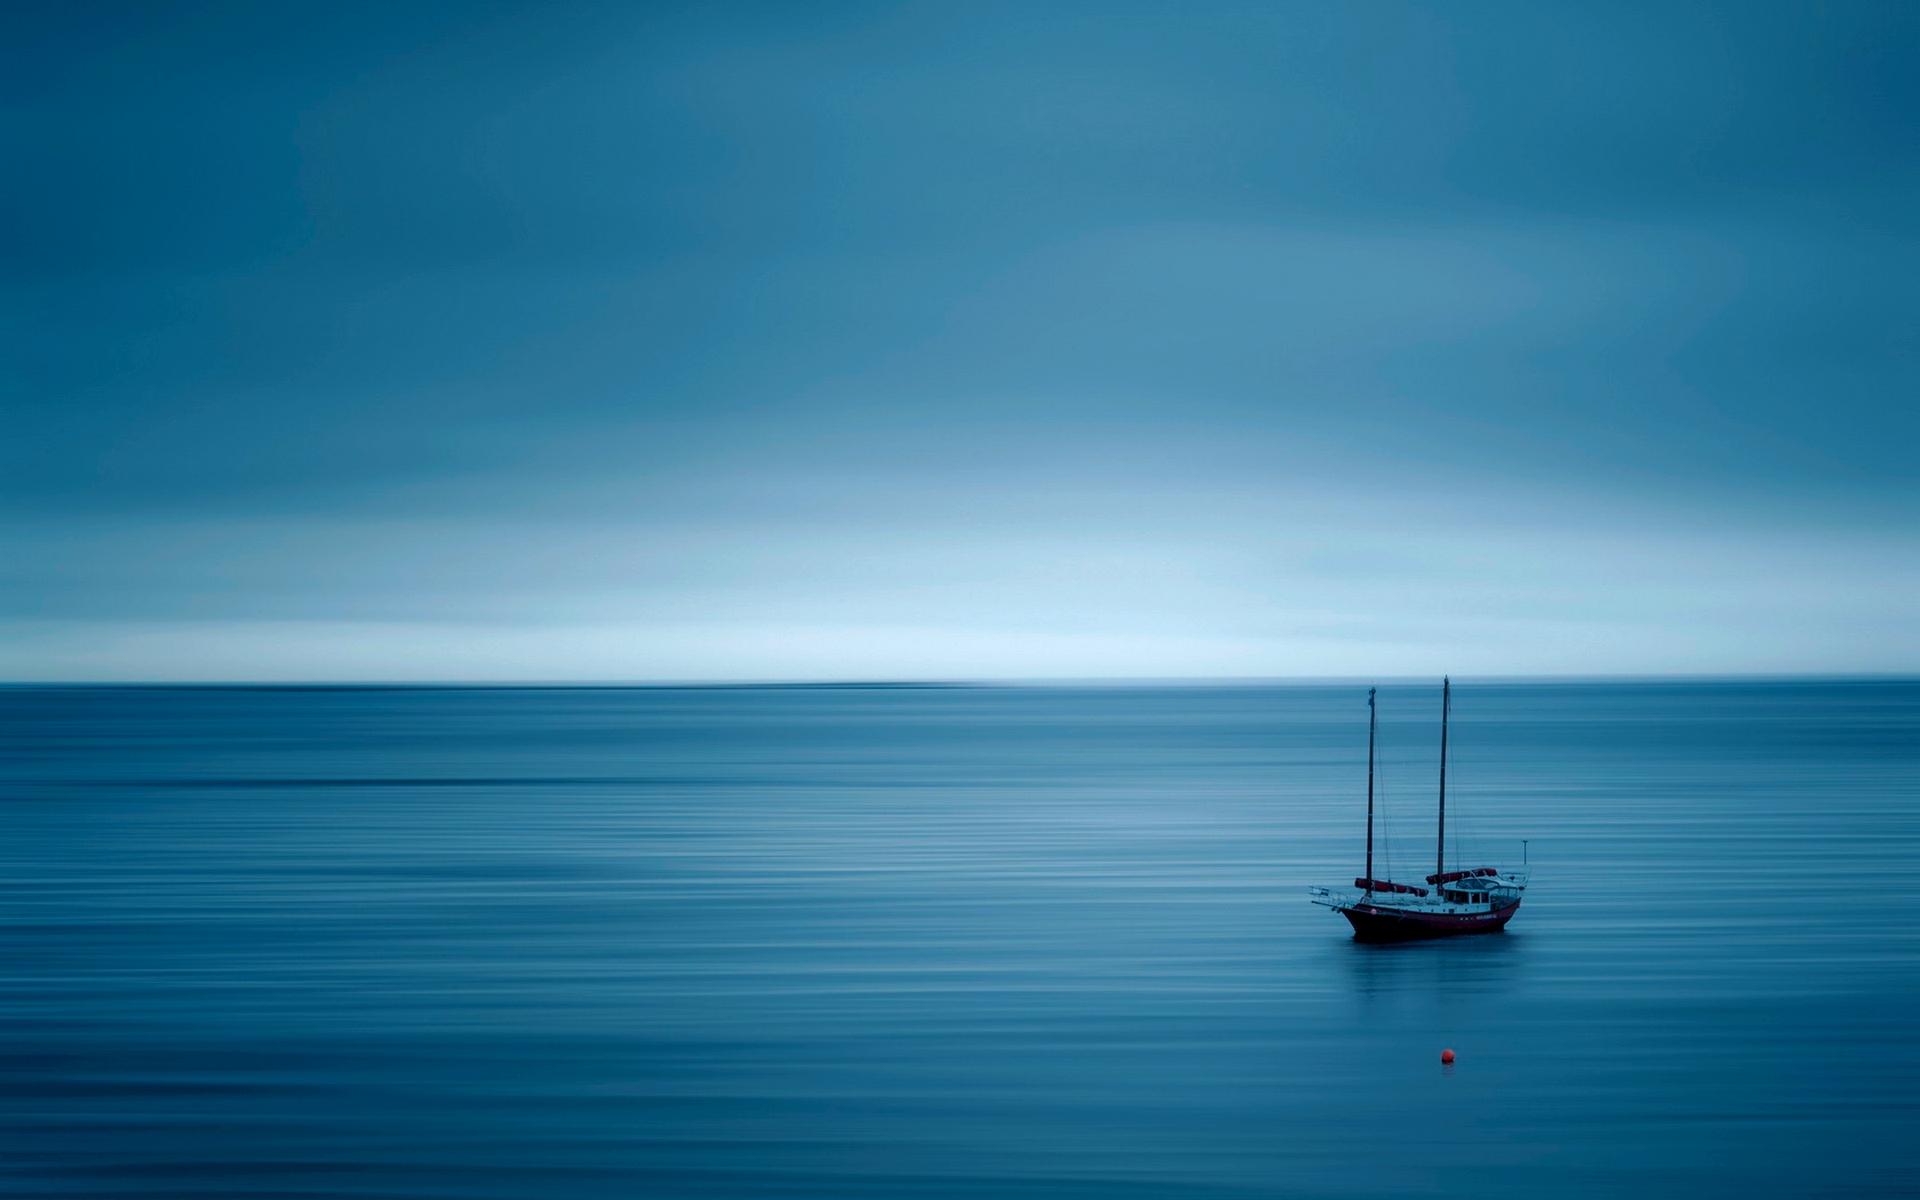 Related Wallpapers. Calm Ocean ...